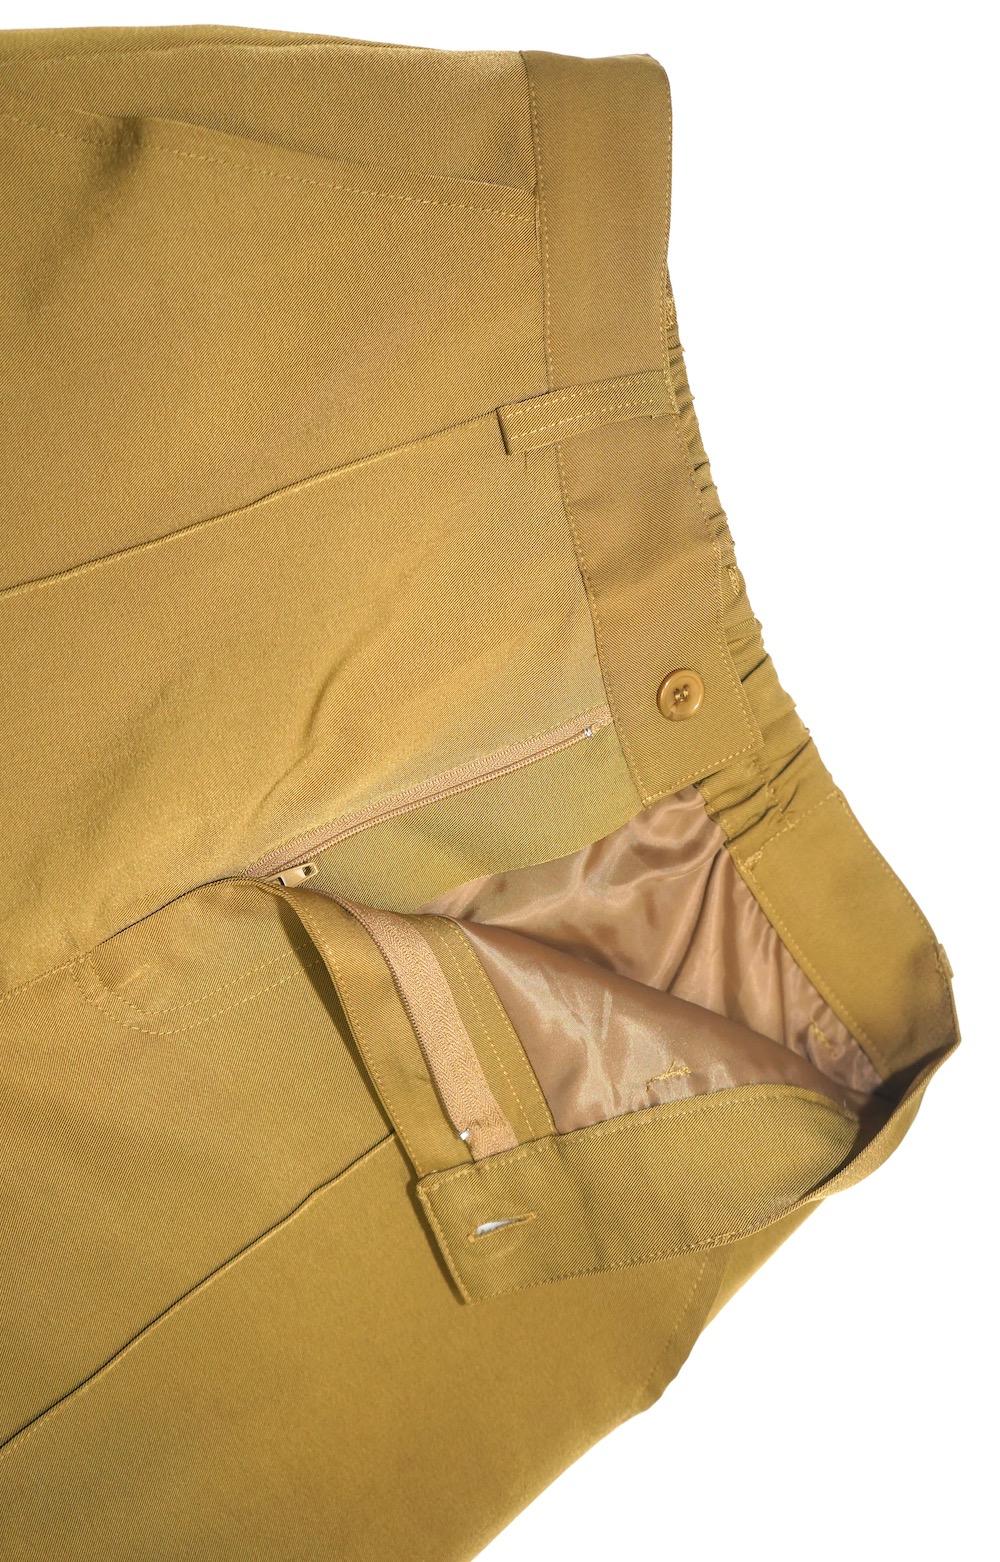 Center Press Flare Slacks (mustard yellow)